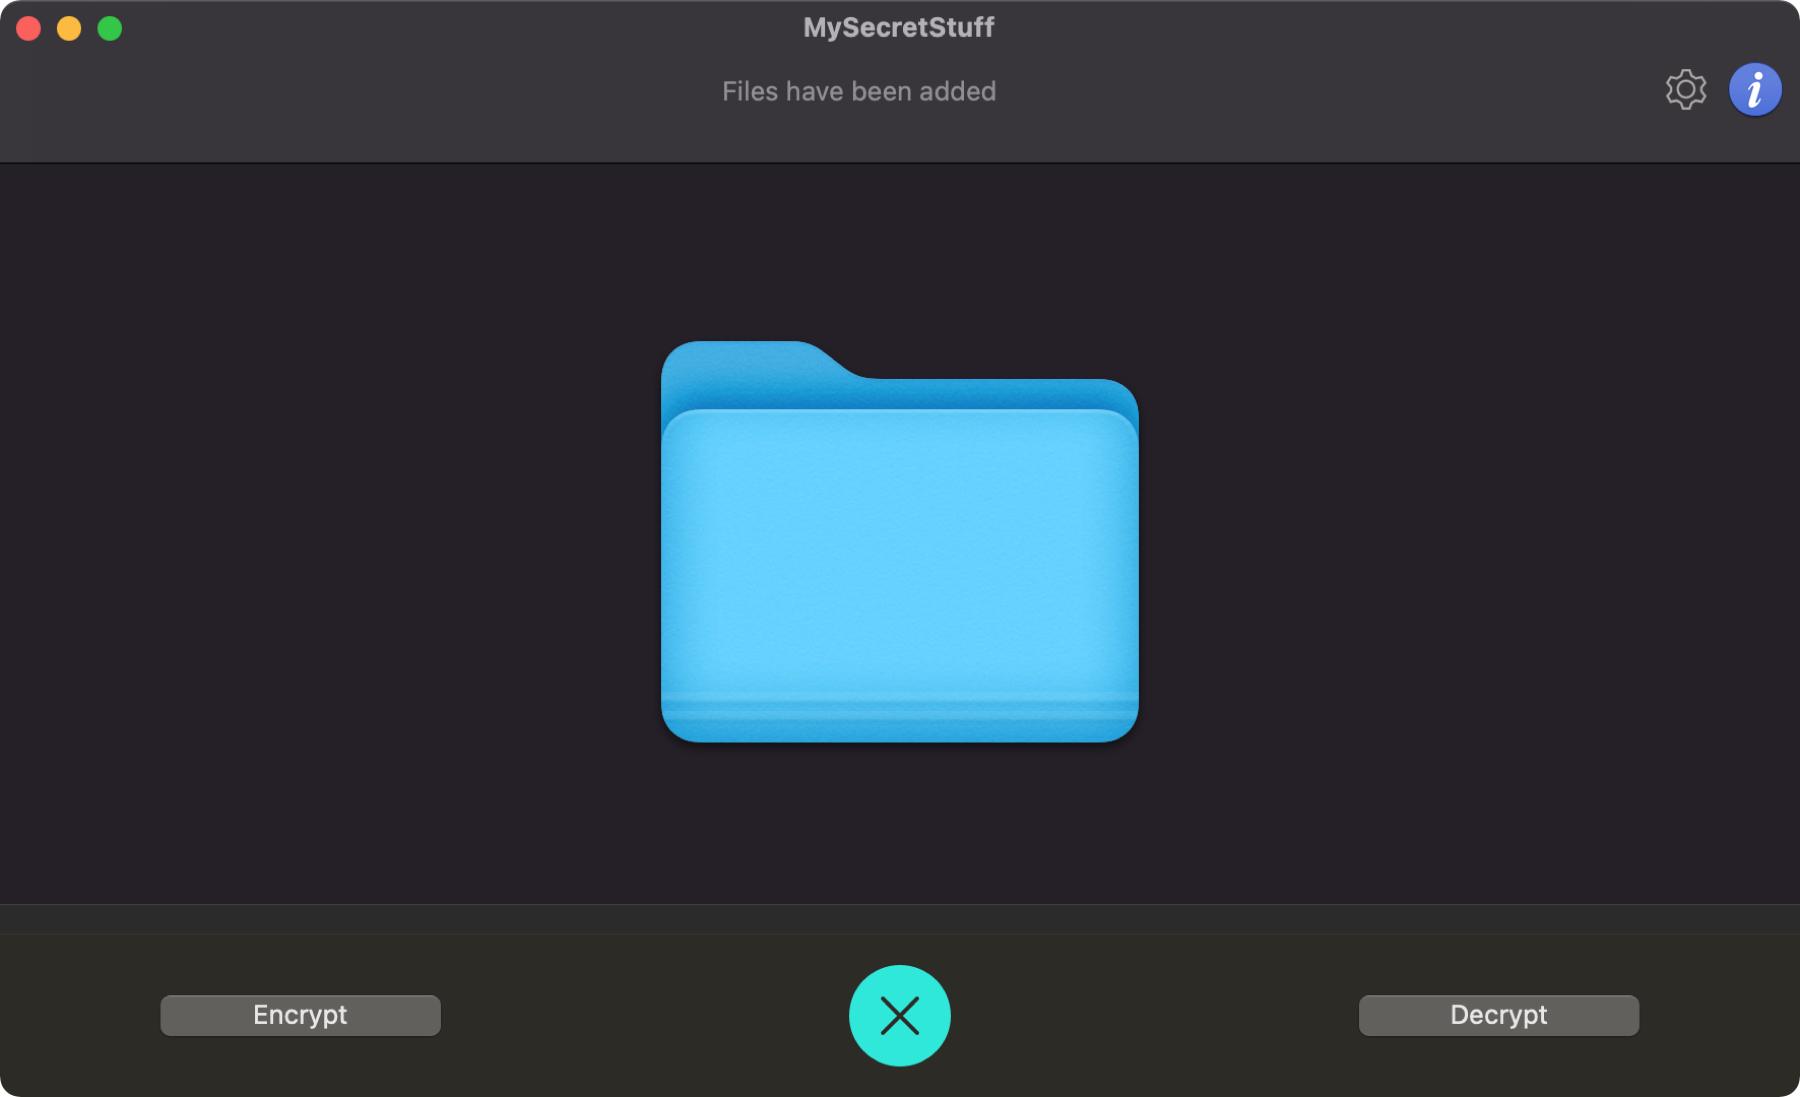 File Zip and Encryptor Folder Added